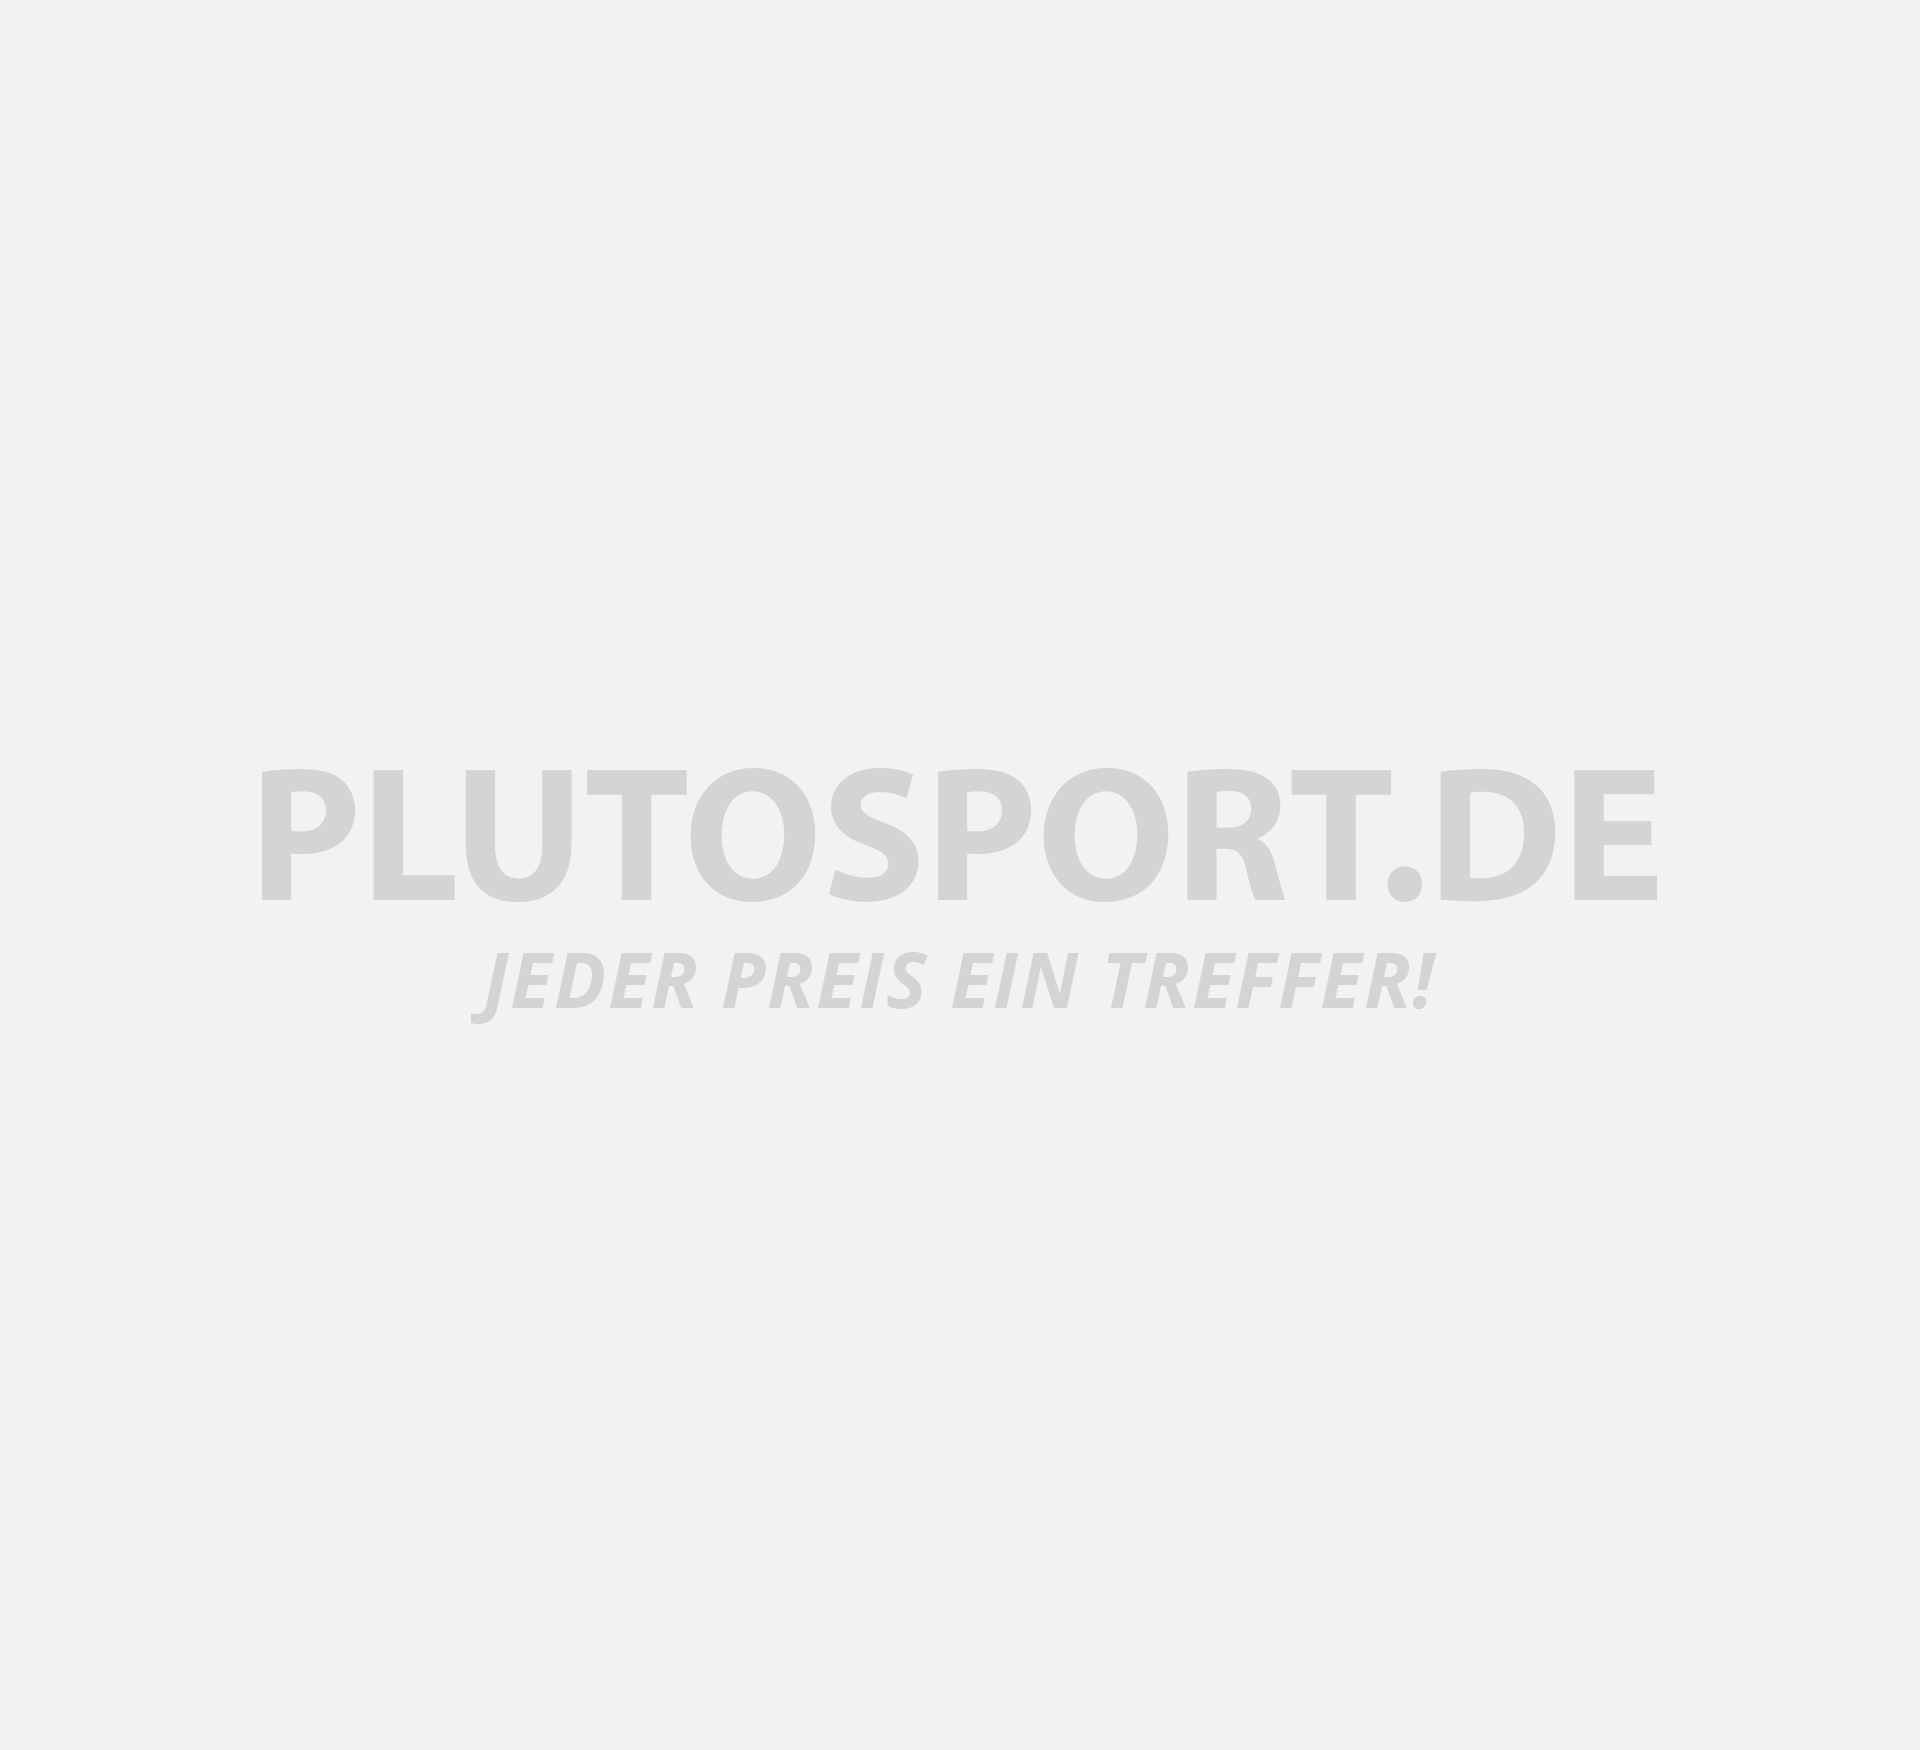 Asics Gel-Blackheath 7 Hockeyschuhe Damen